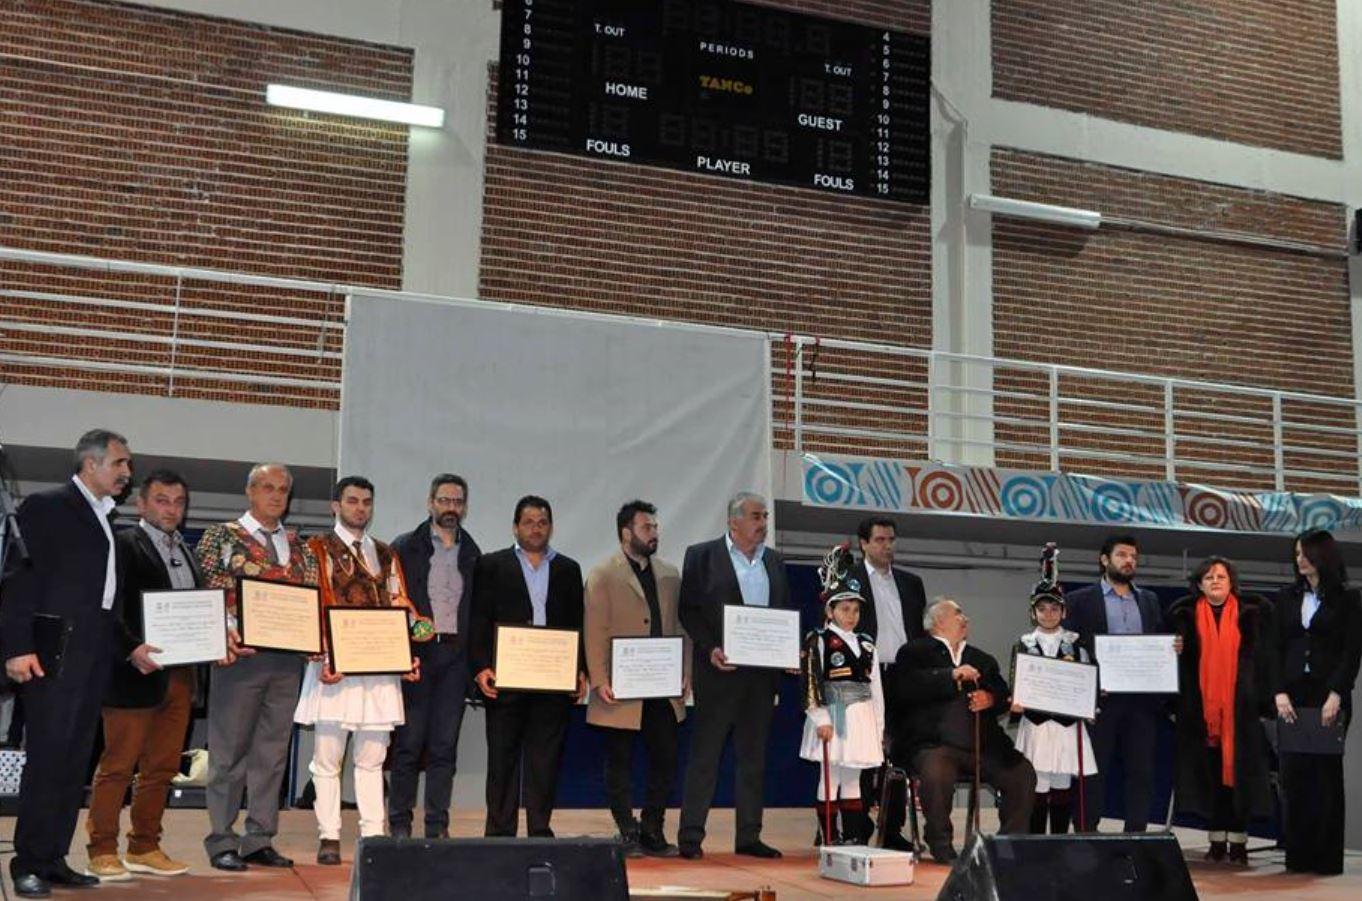 Tο πρώτο επίσημο βήμα έναρξης των συντεταγμένων προσπαθειών του Δήμου για την ένταξη των Λαζαρίνων του Τσαρτσαμπά – Tι αναφέρει το επίσημο δελτίο τύπου του δήμου Κοζάνης